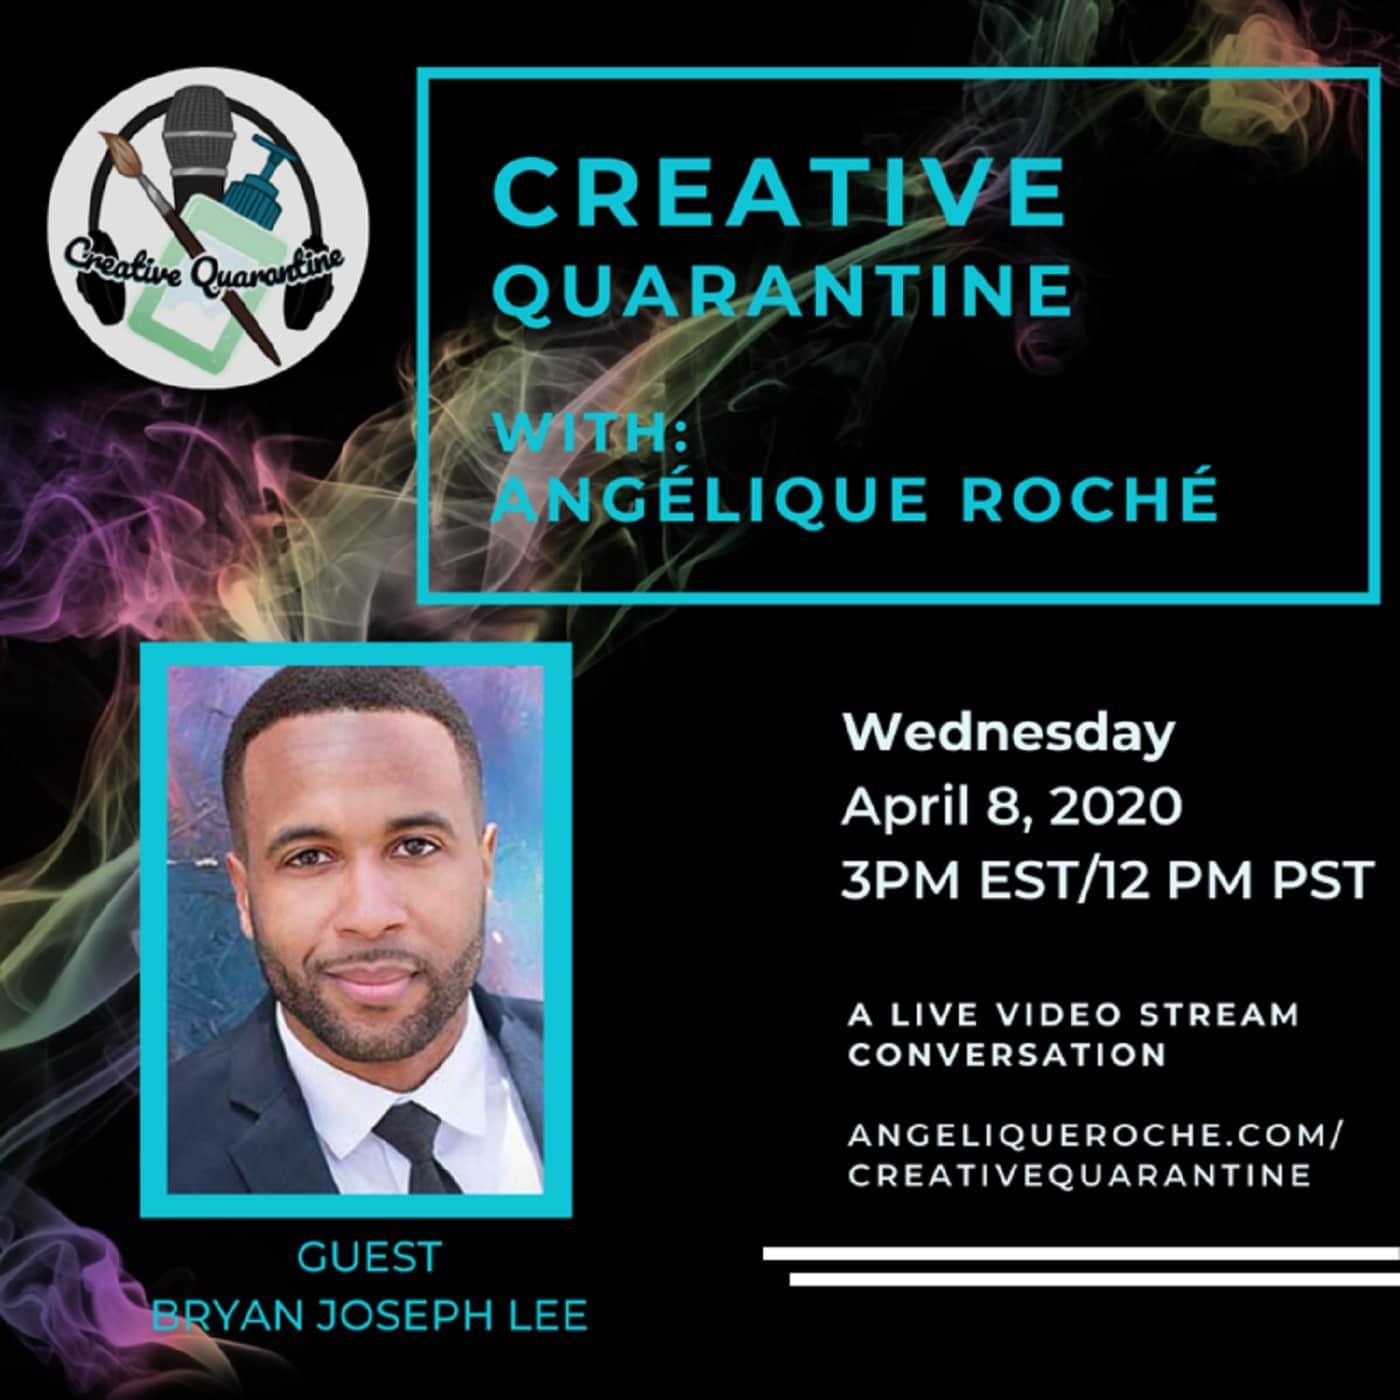 Creative Quarantine - Episode 13: Producer, Bryan Joseph Lee